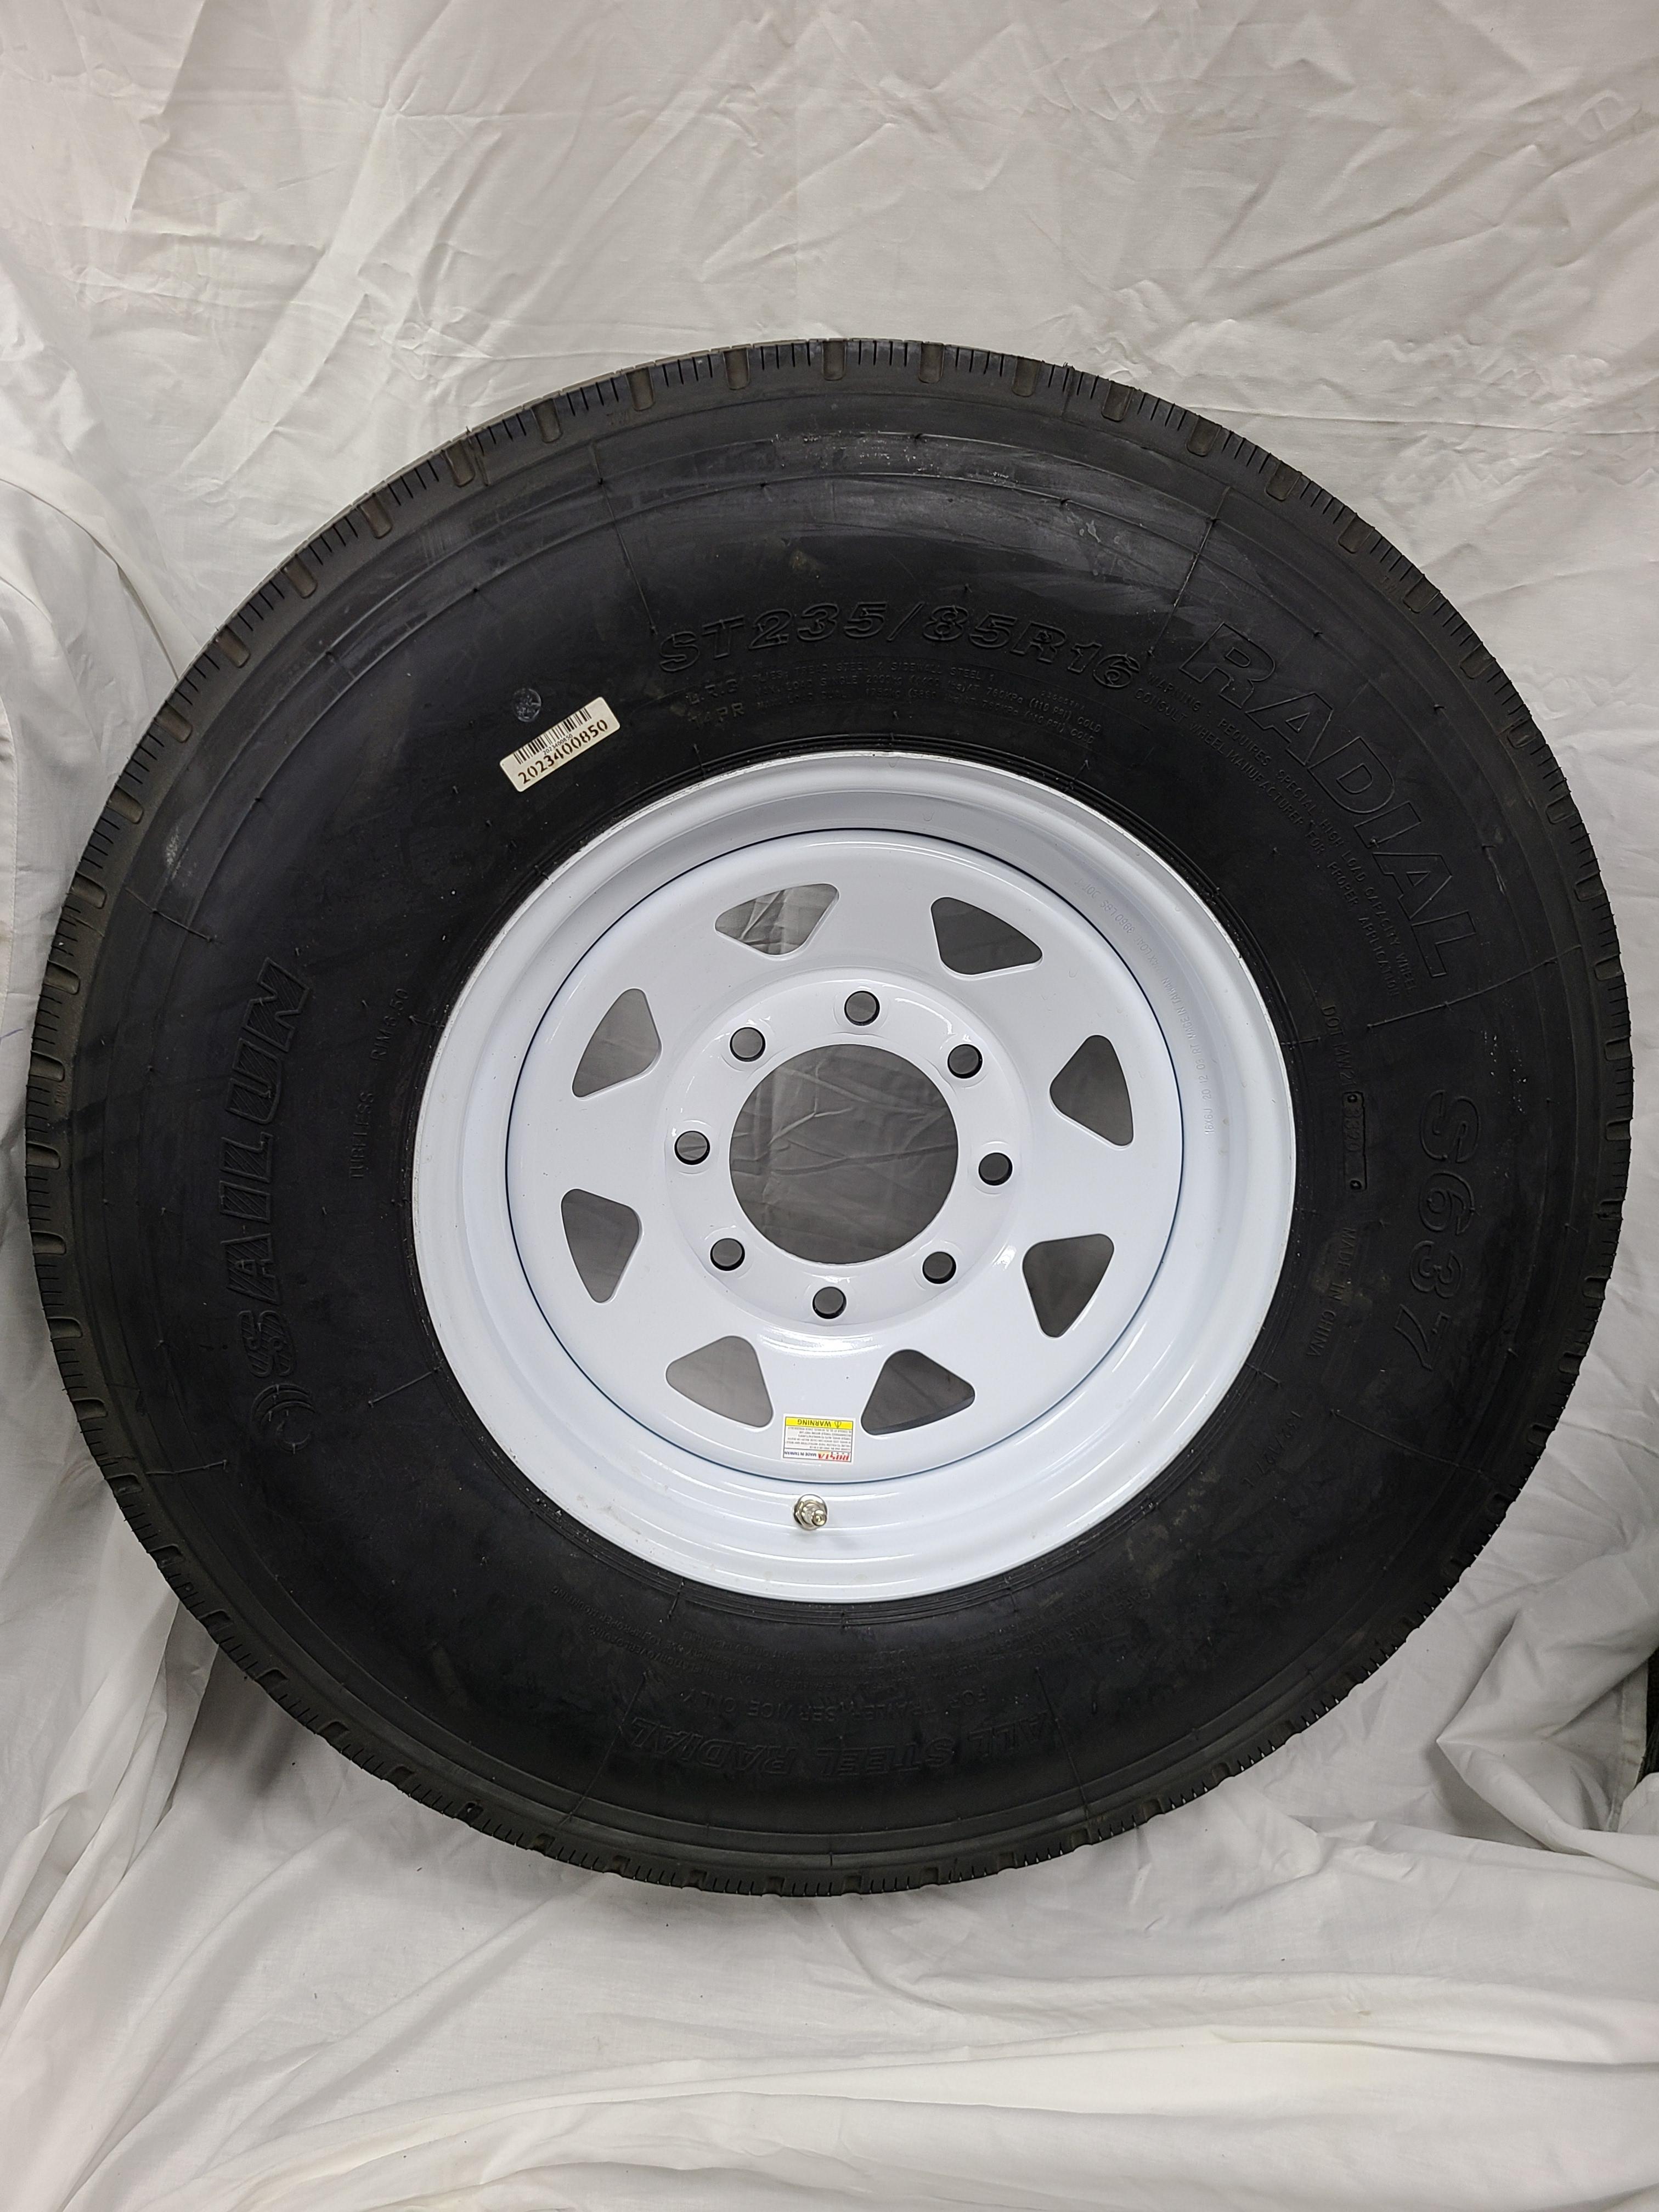 ST235/85/R16 Trailer Tire Load Range G 8 Hole White Spoke